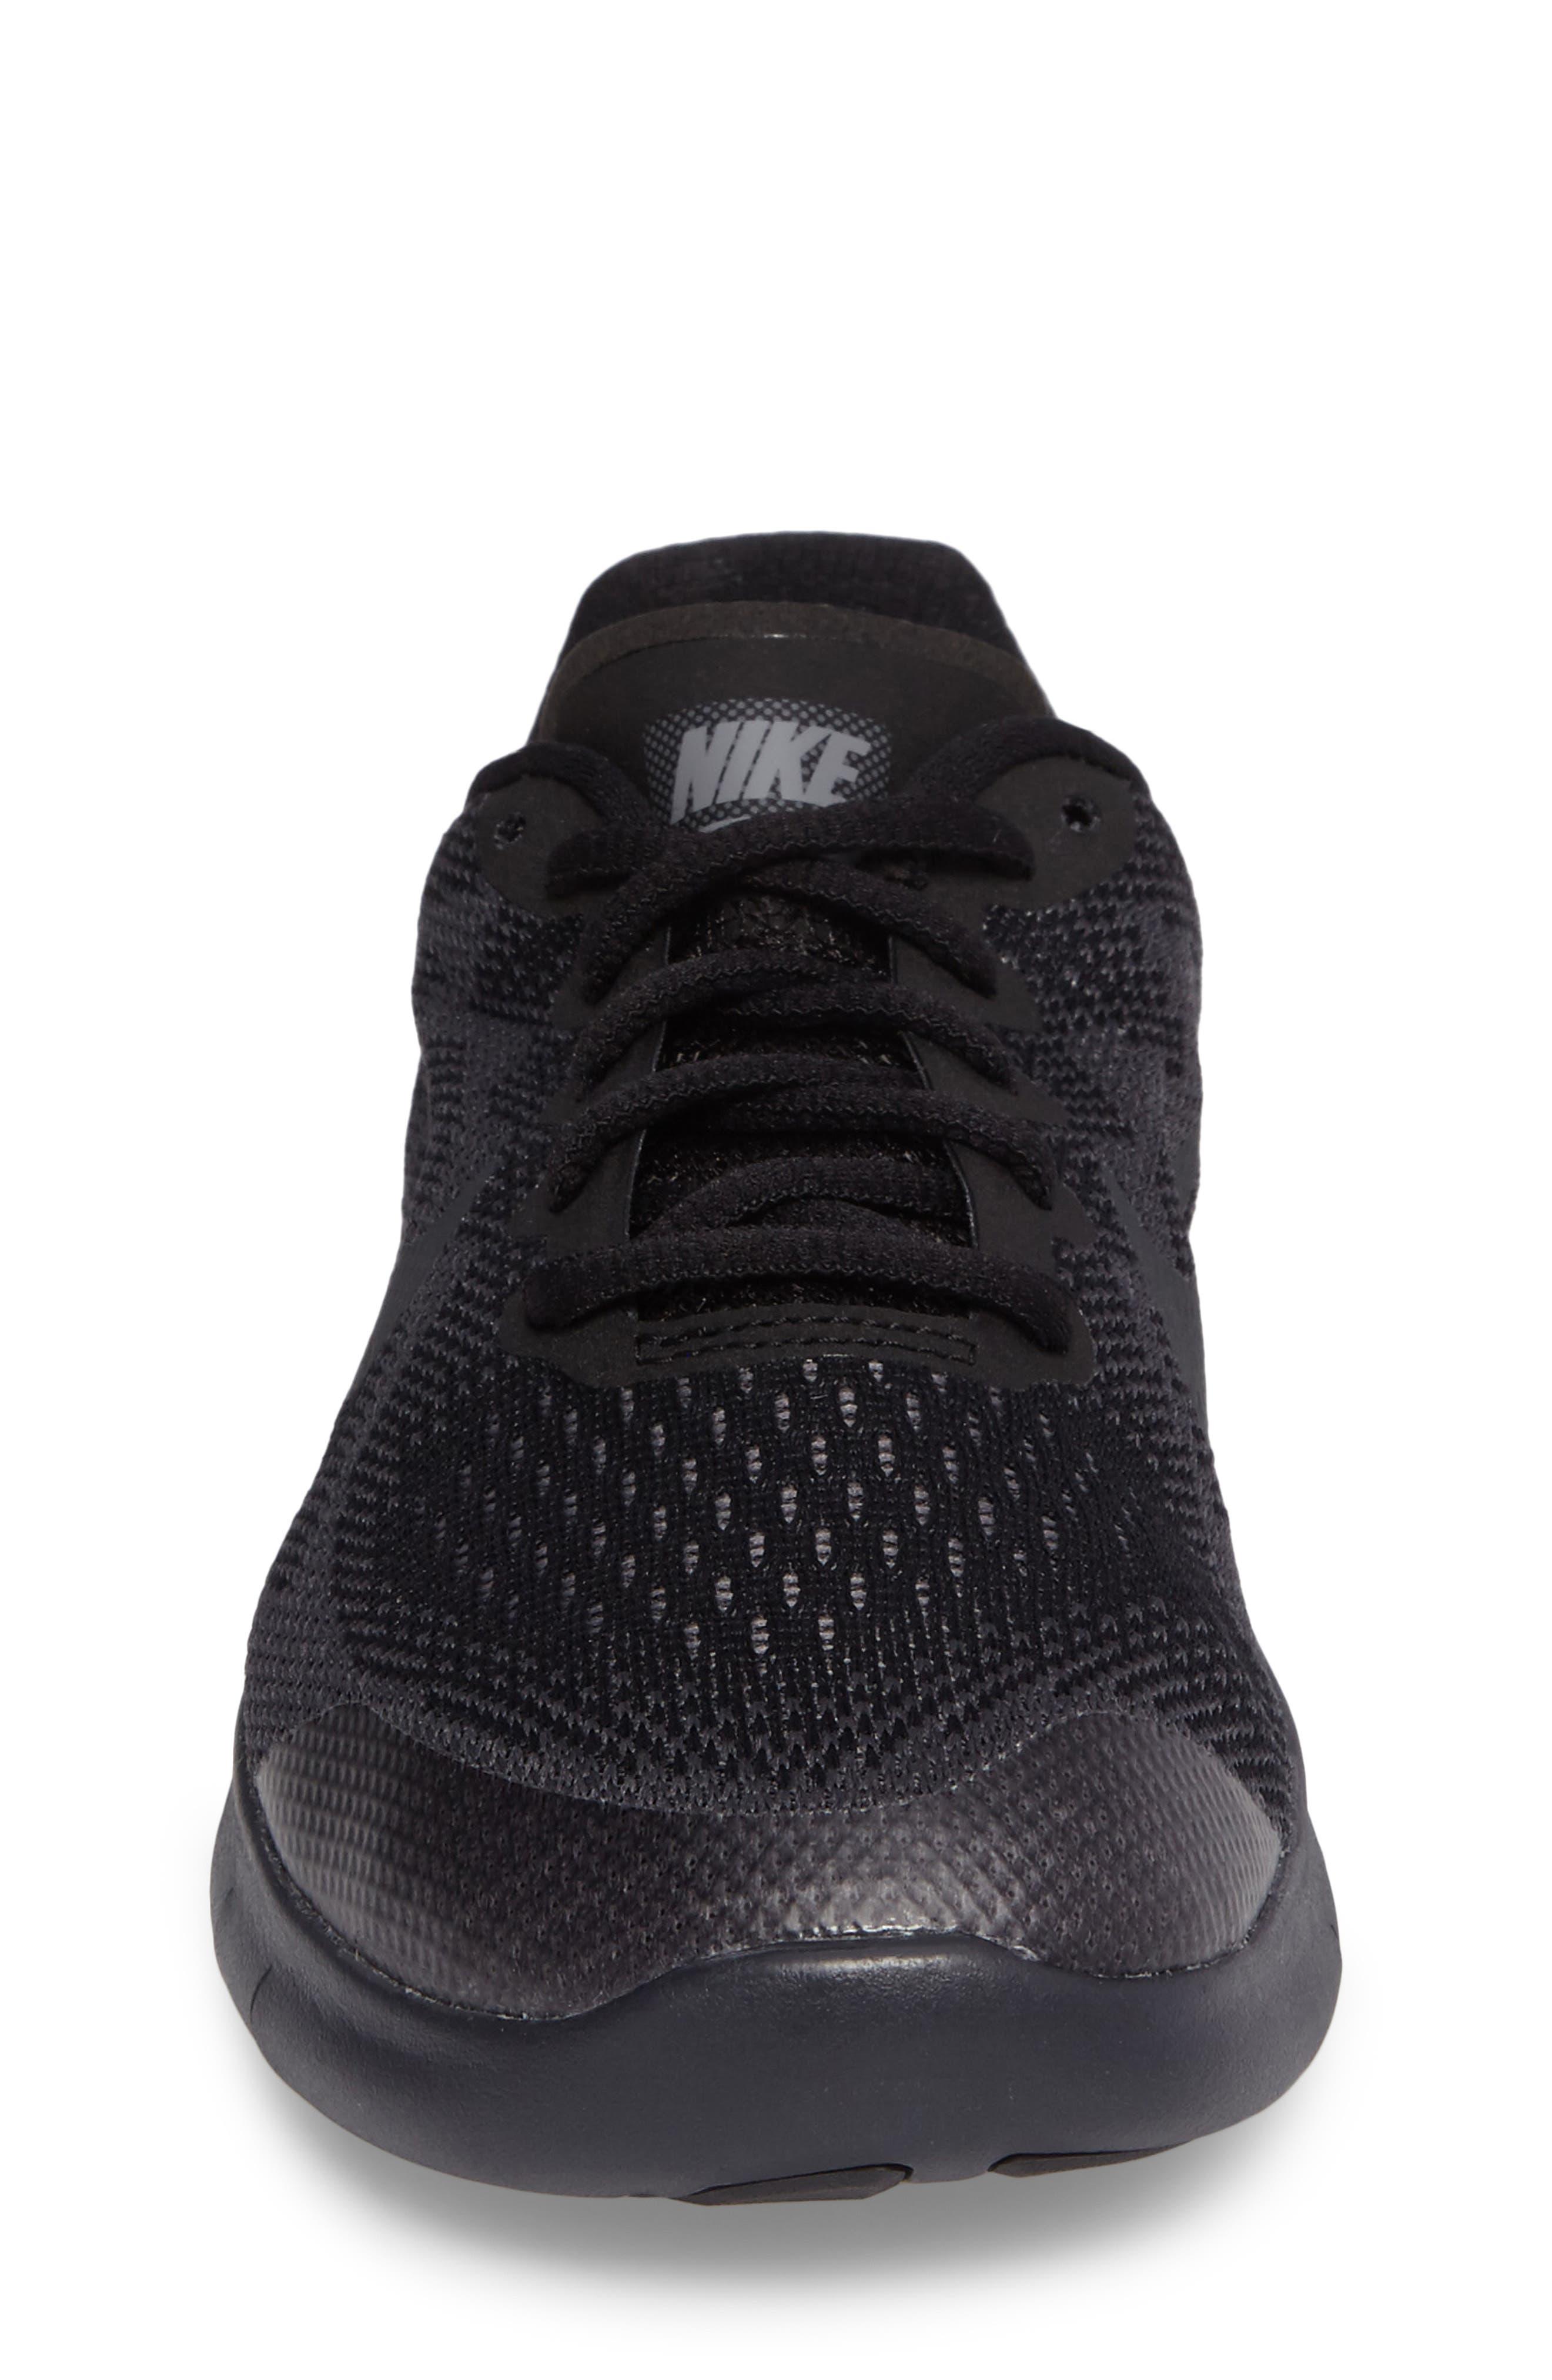 Free RN Running Shoe,                             Alternate thumbnail 4, color,                             Black/ Anthracite/ Dark Grey